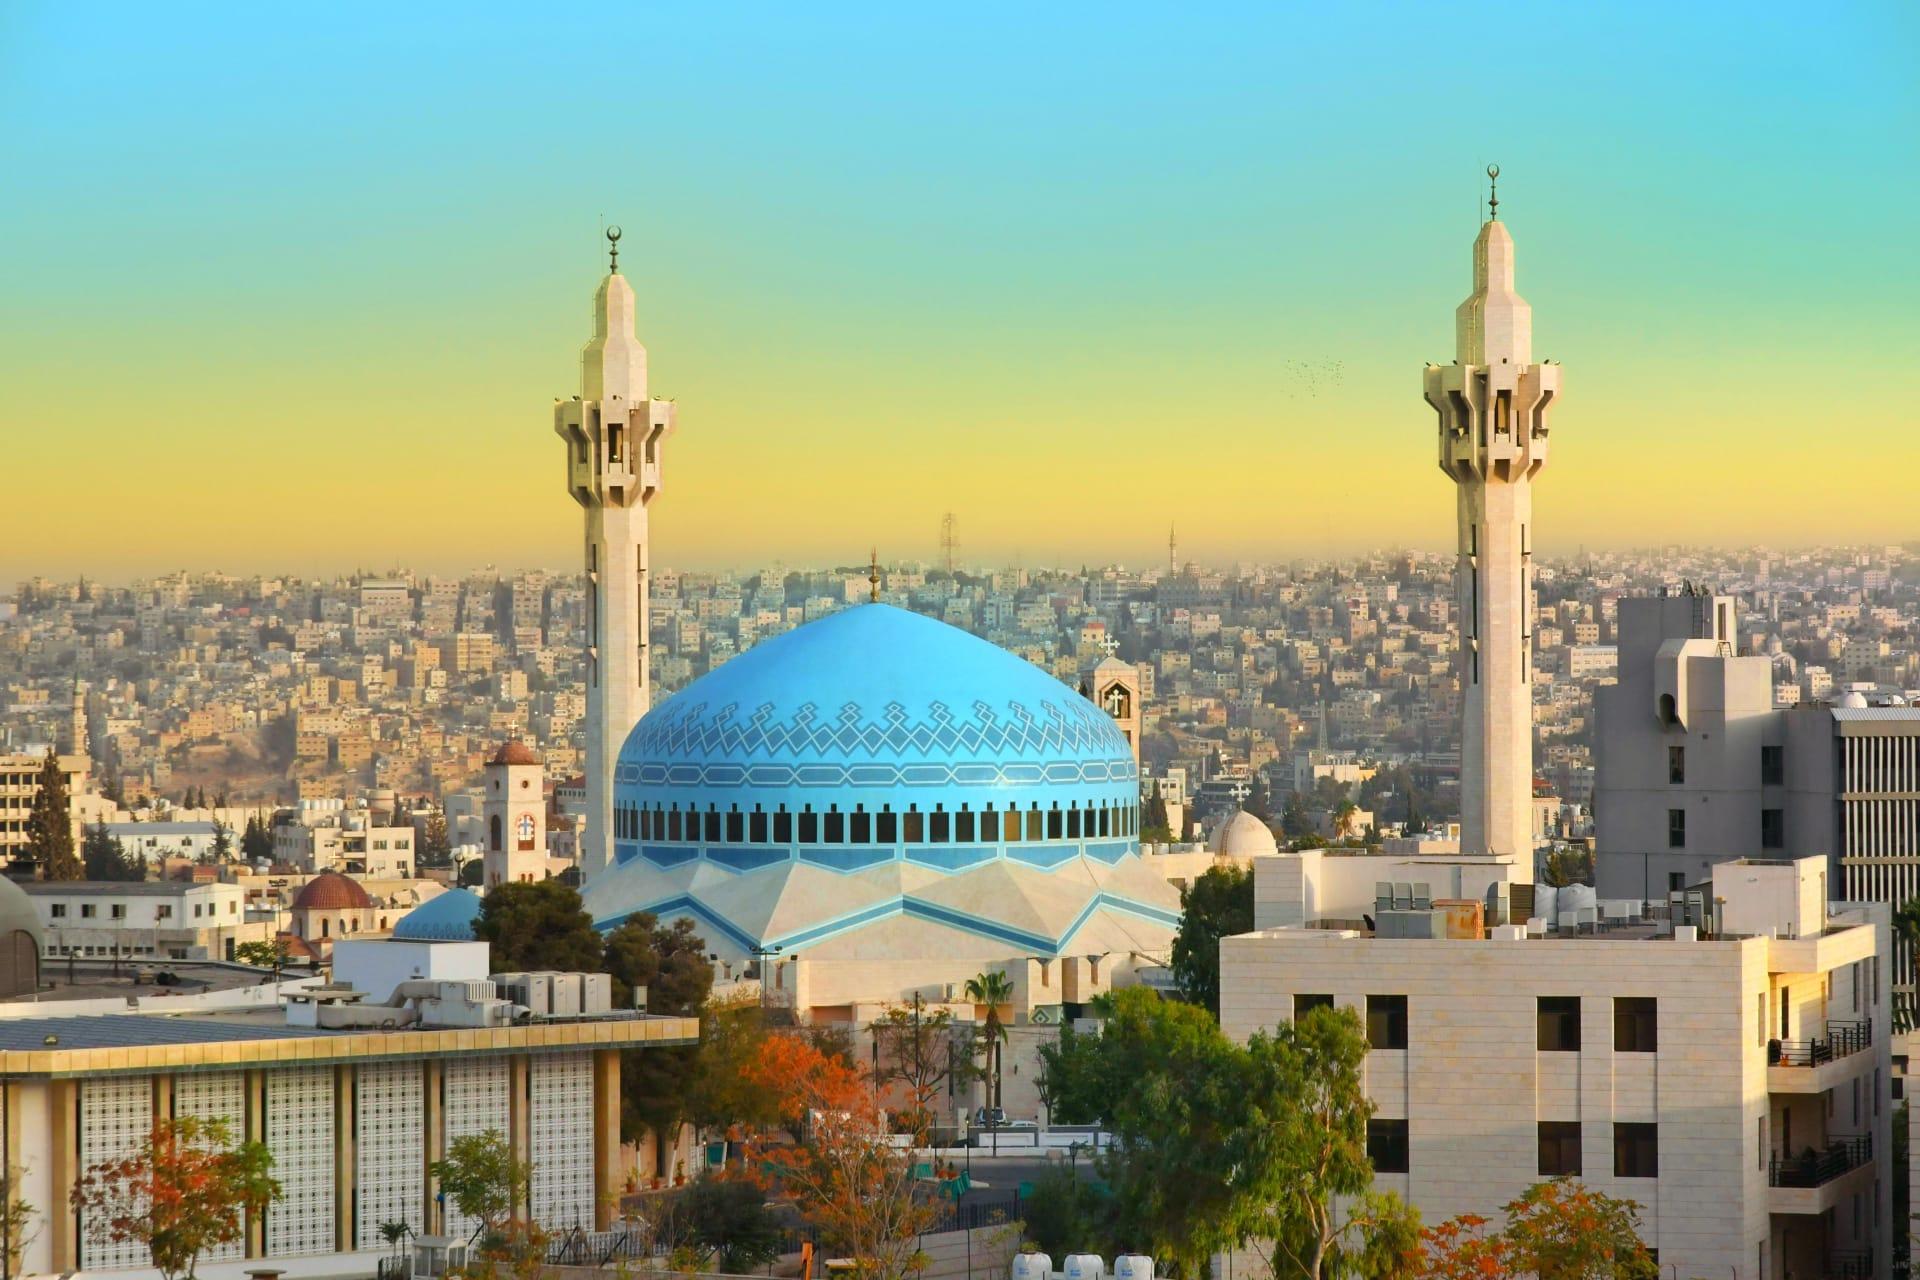 Amman - The Blue Mosque (King Abdullah The First)